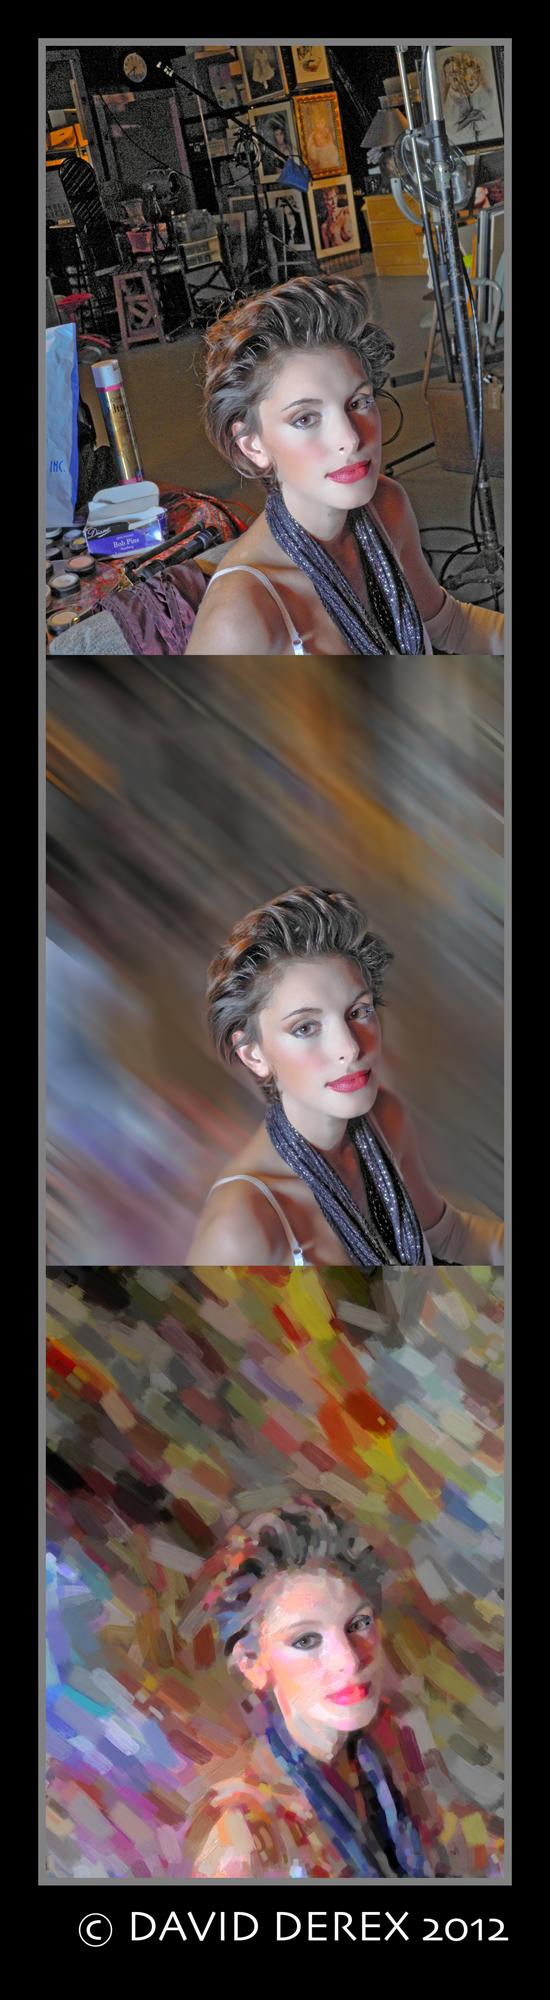 New York Metro Feb 16, 2012 David Derex Windowlight, In the Makeup Chair - hair & makeup by Kathleen M. Scanlon